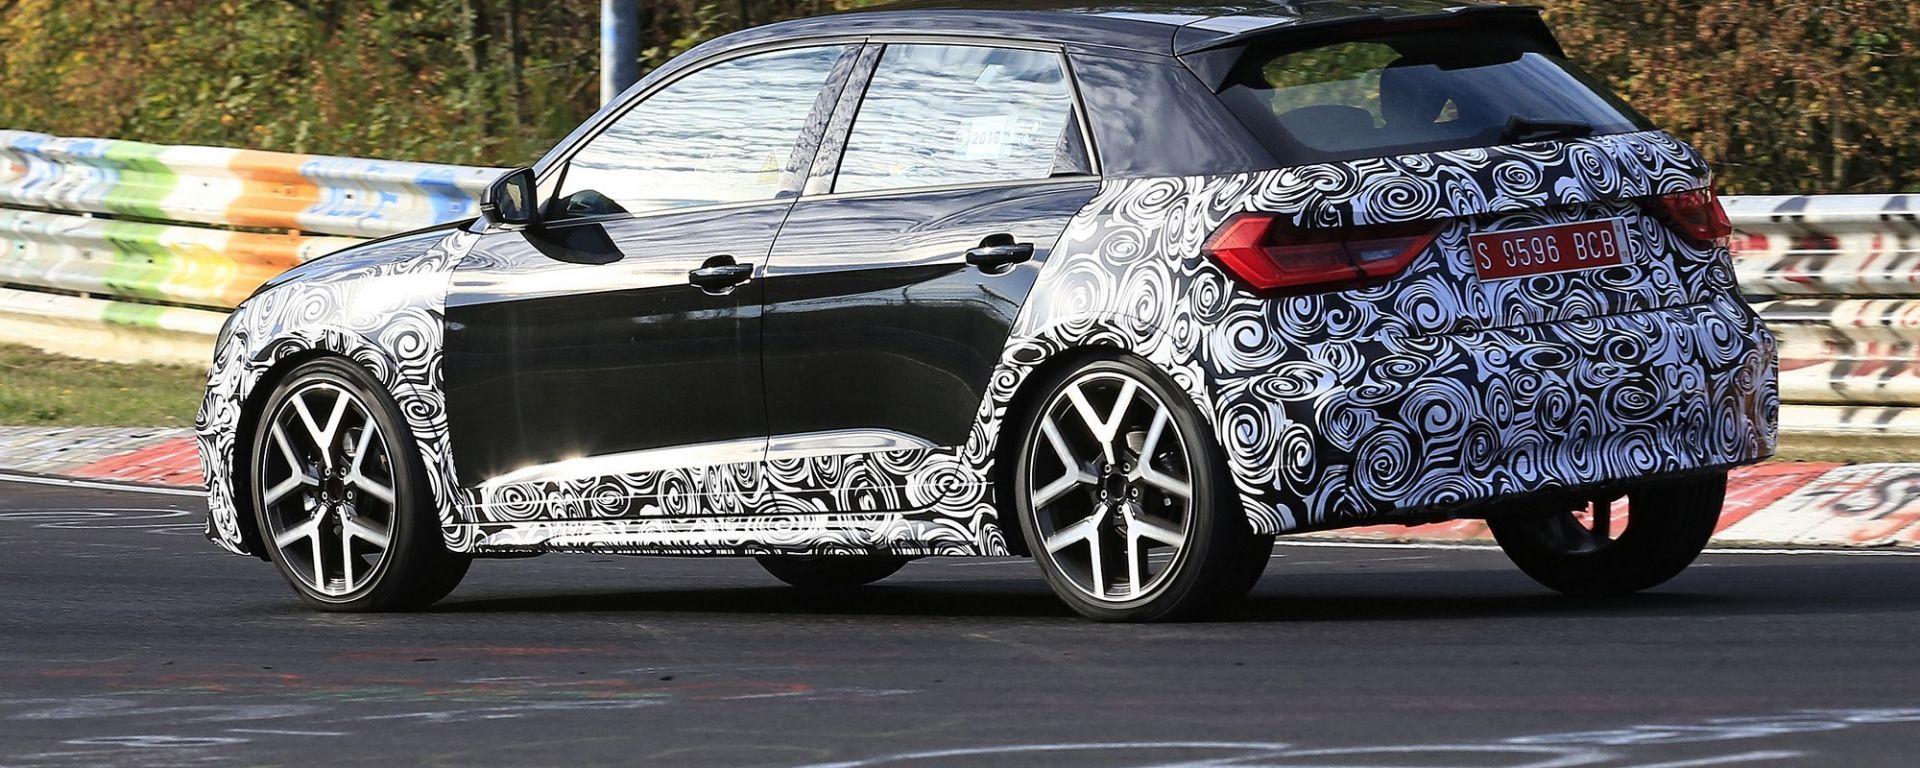 Audi A1 Allroad, prime foto spia